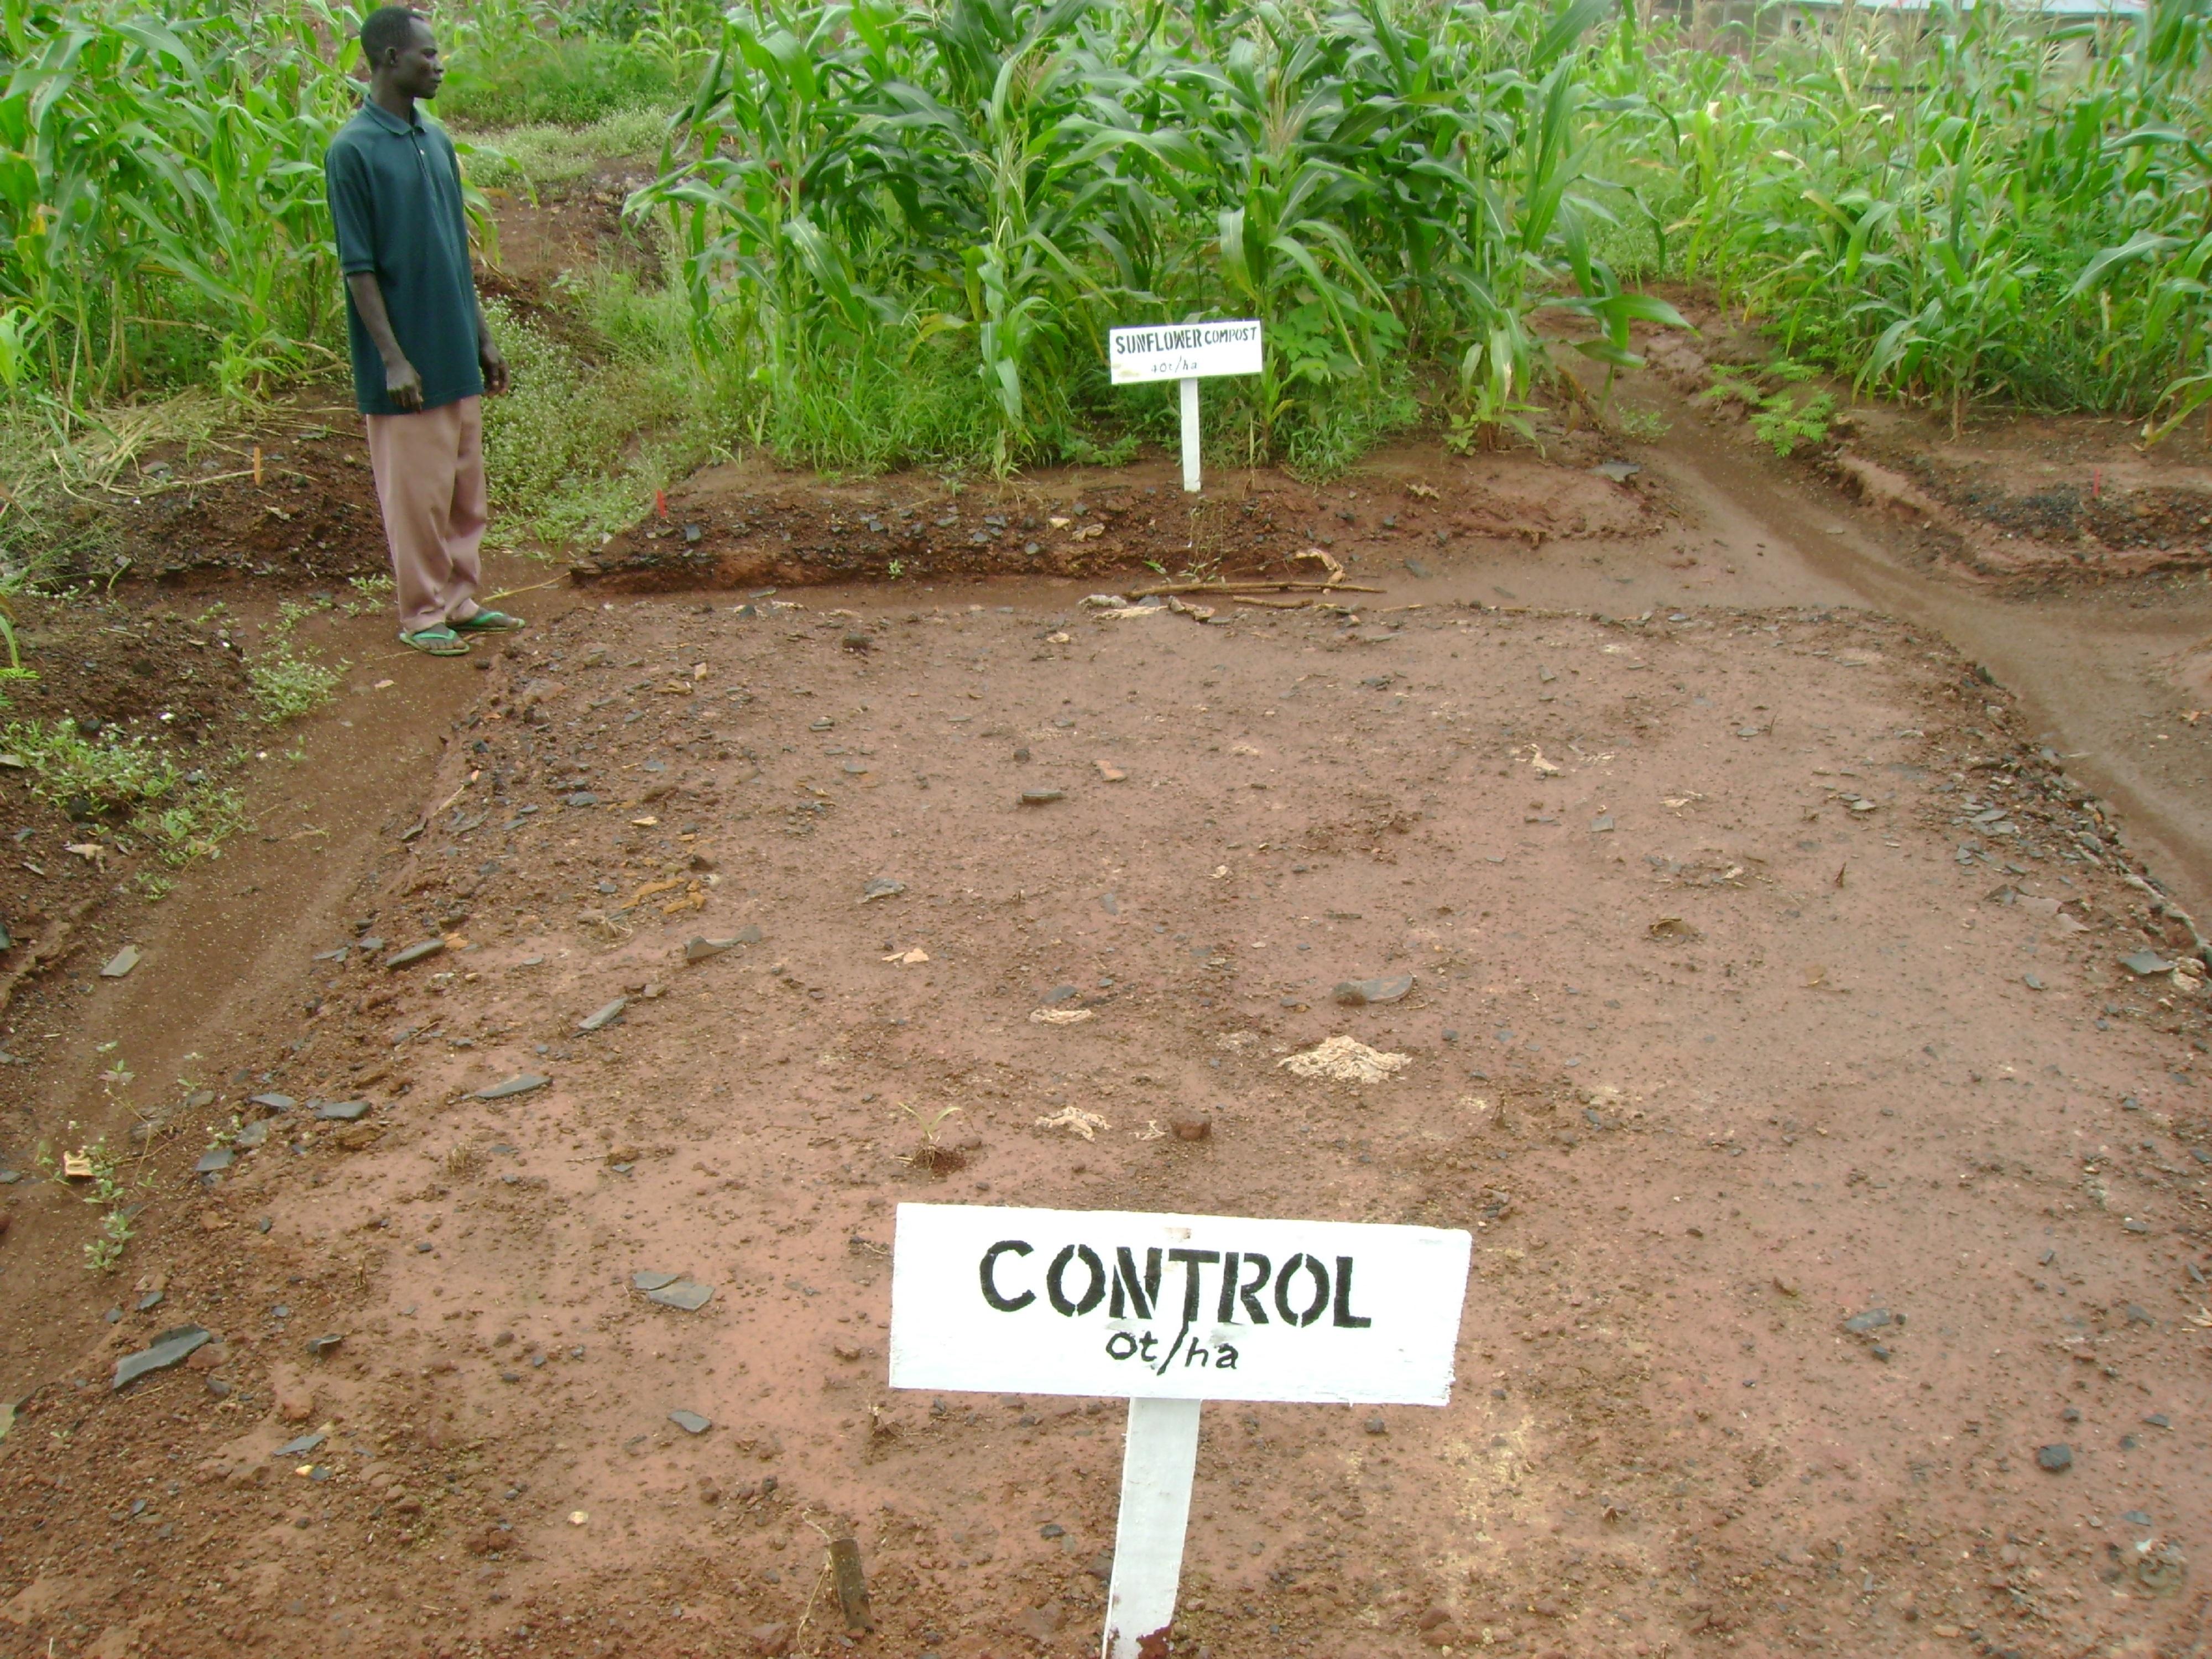 Land Reclamation Project on a Lead-Acid battery waste dumpsite in Ibadan, Nigeria.